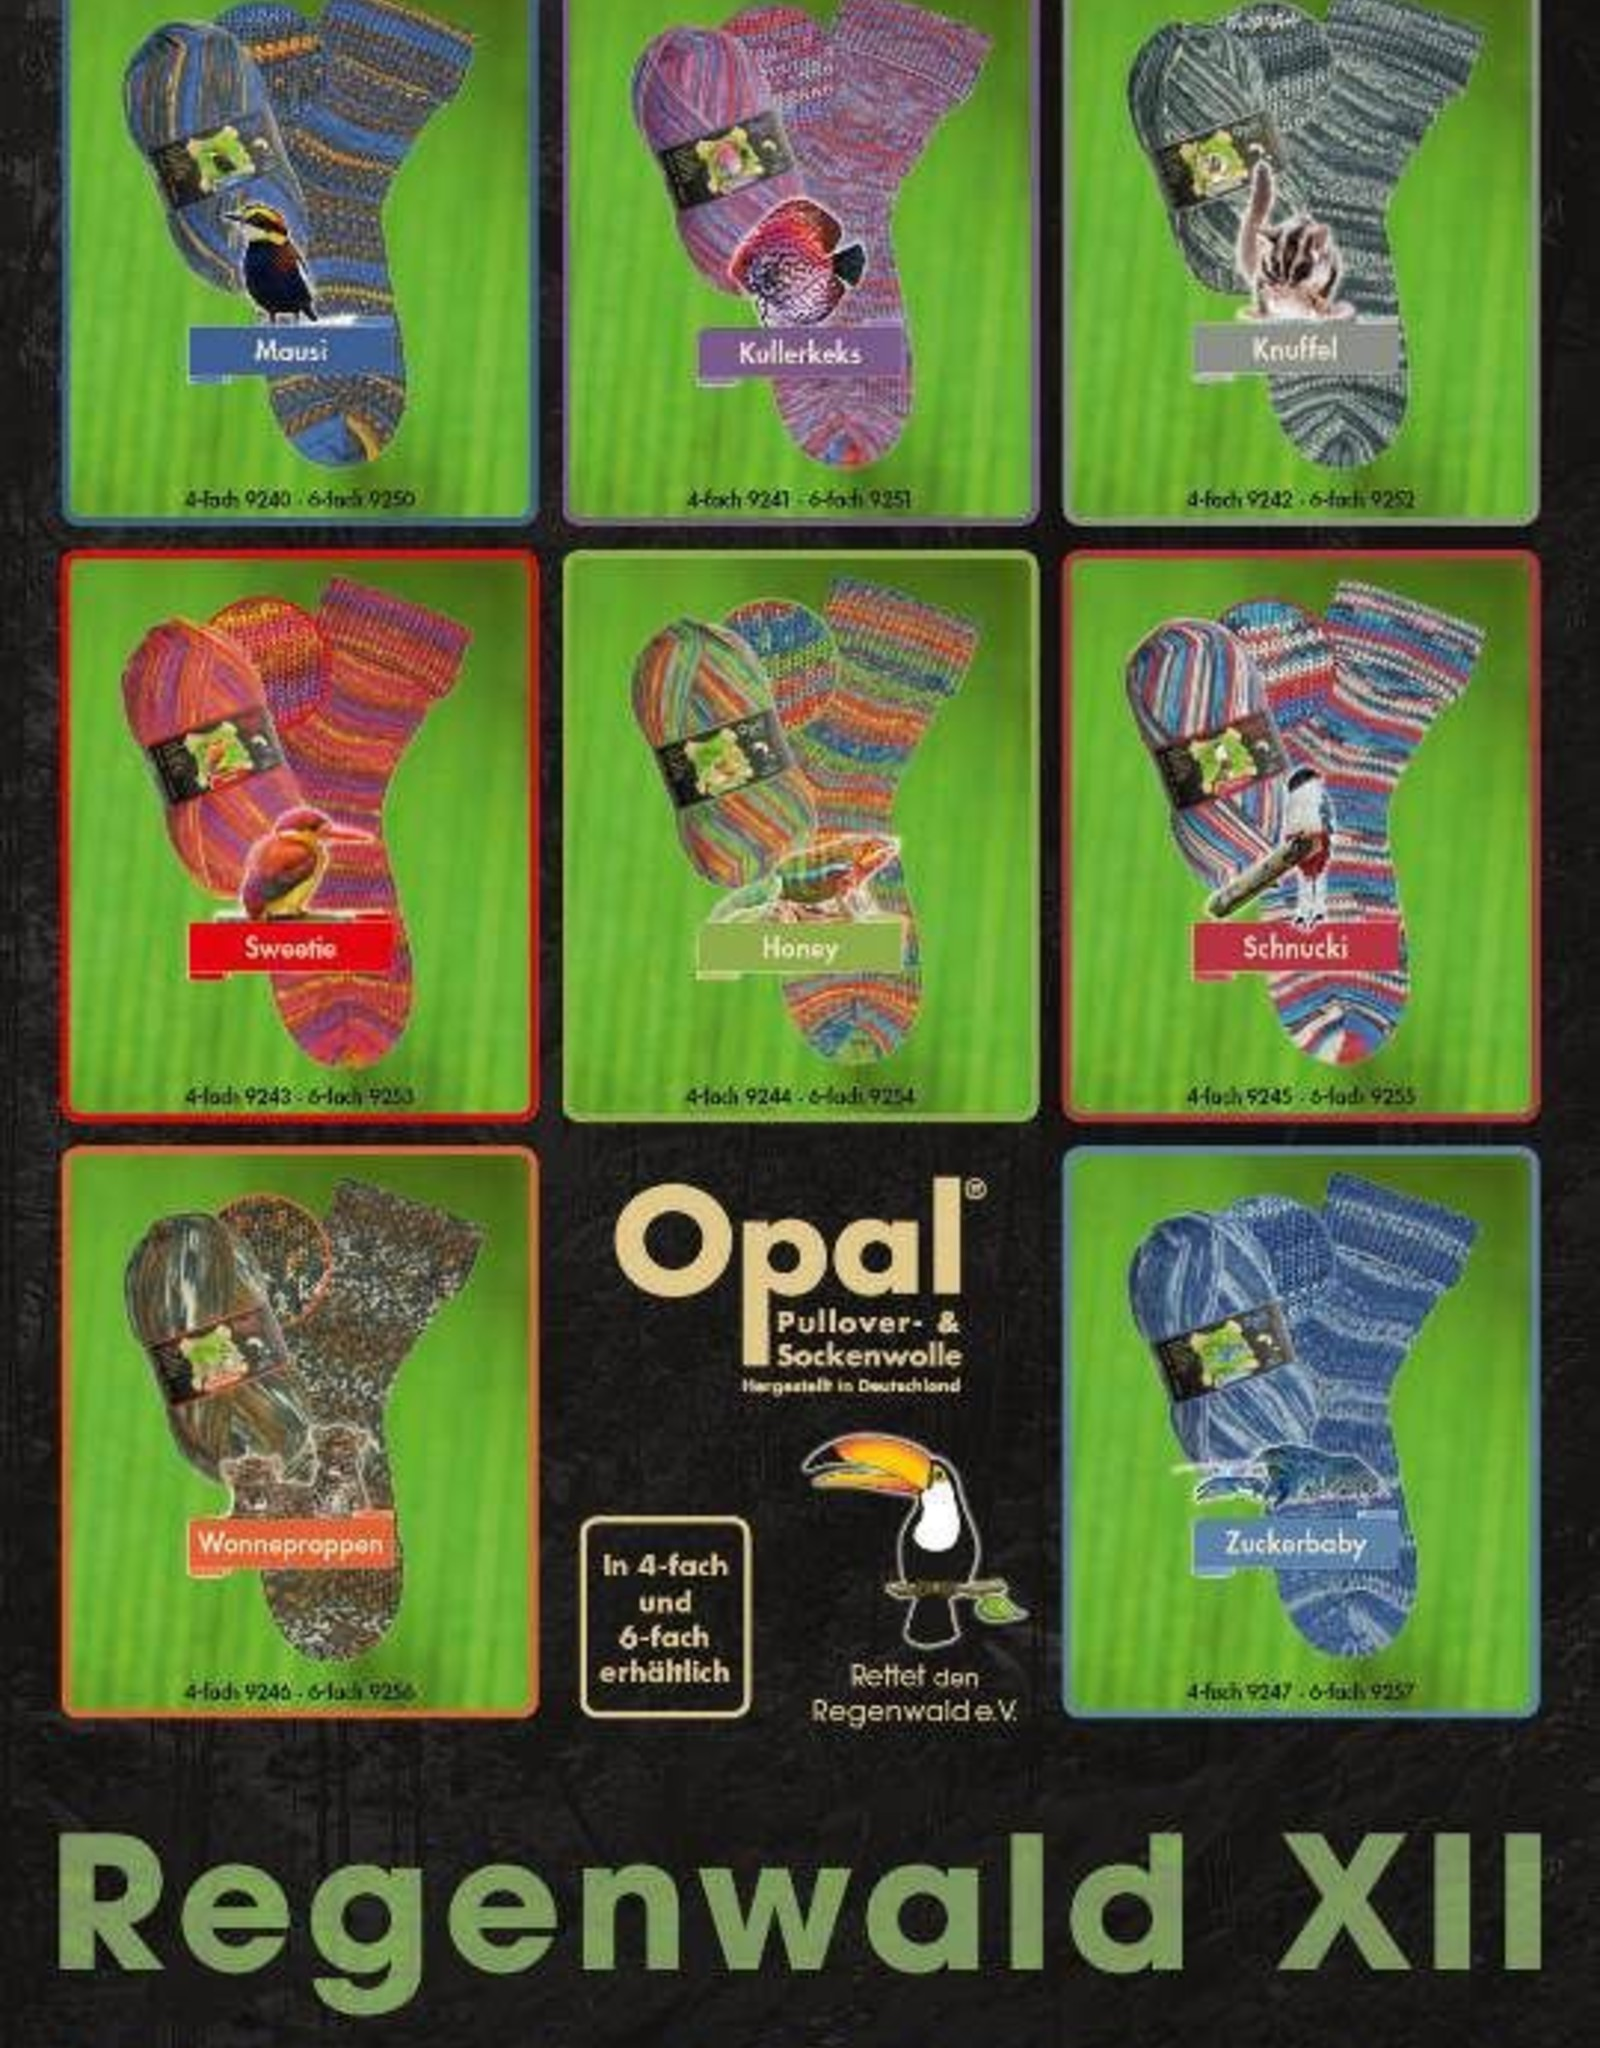 Opal Rainforest 12 by Opal